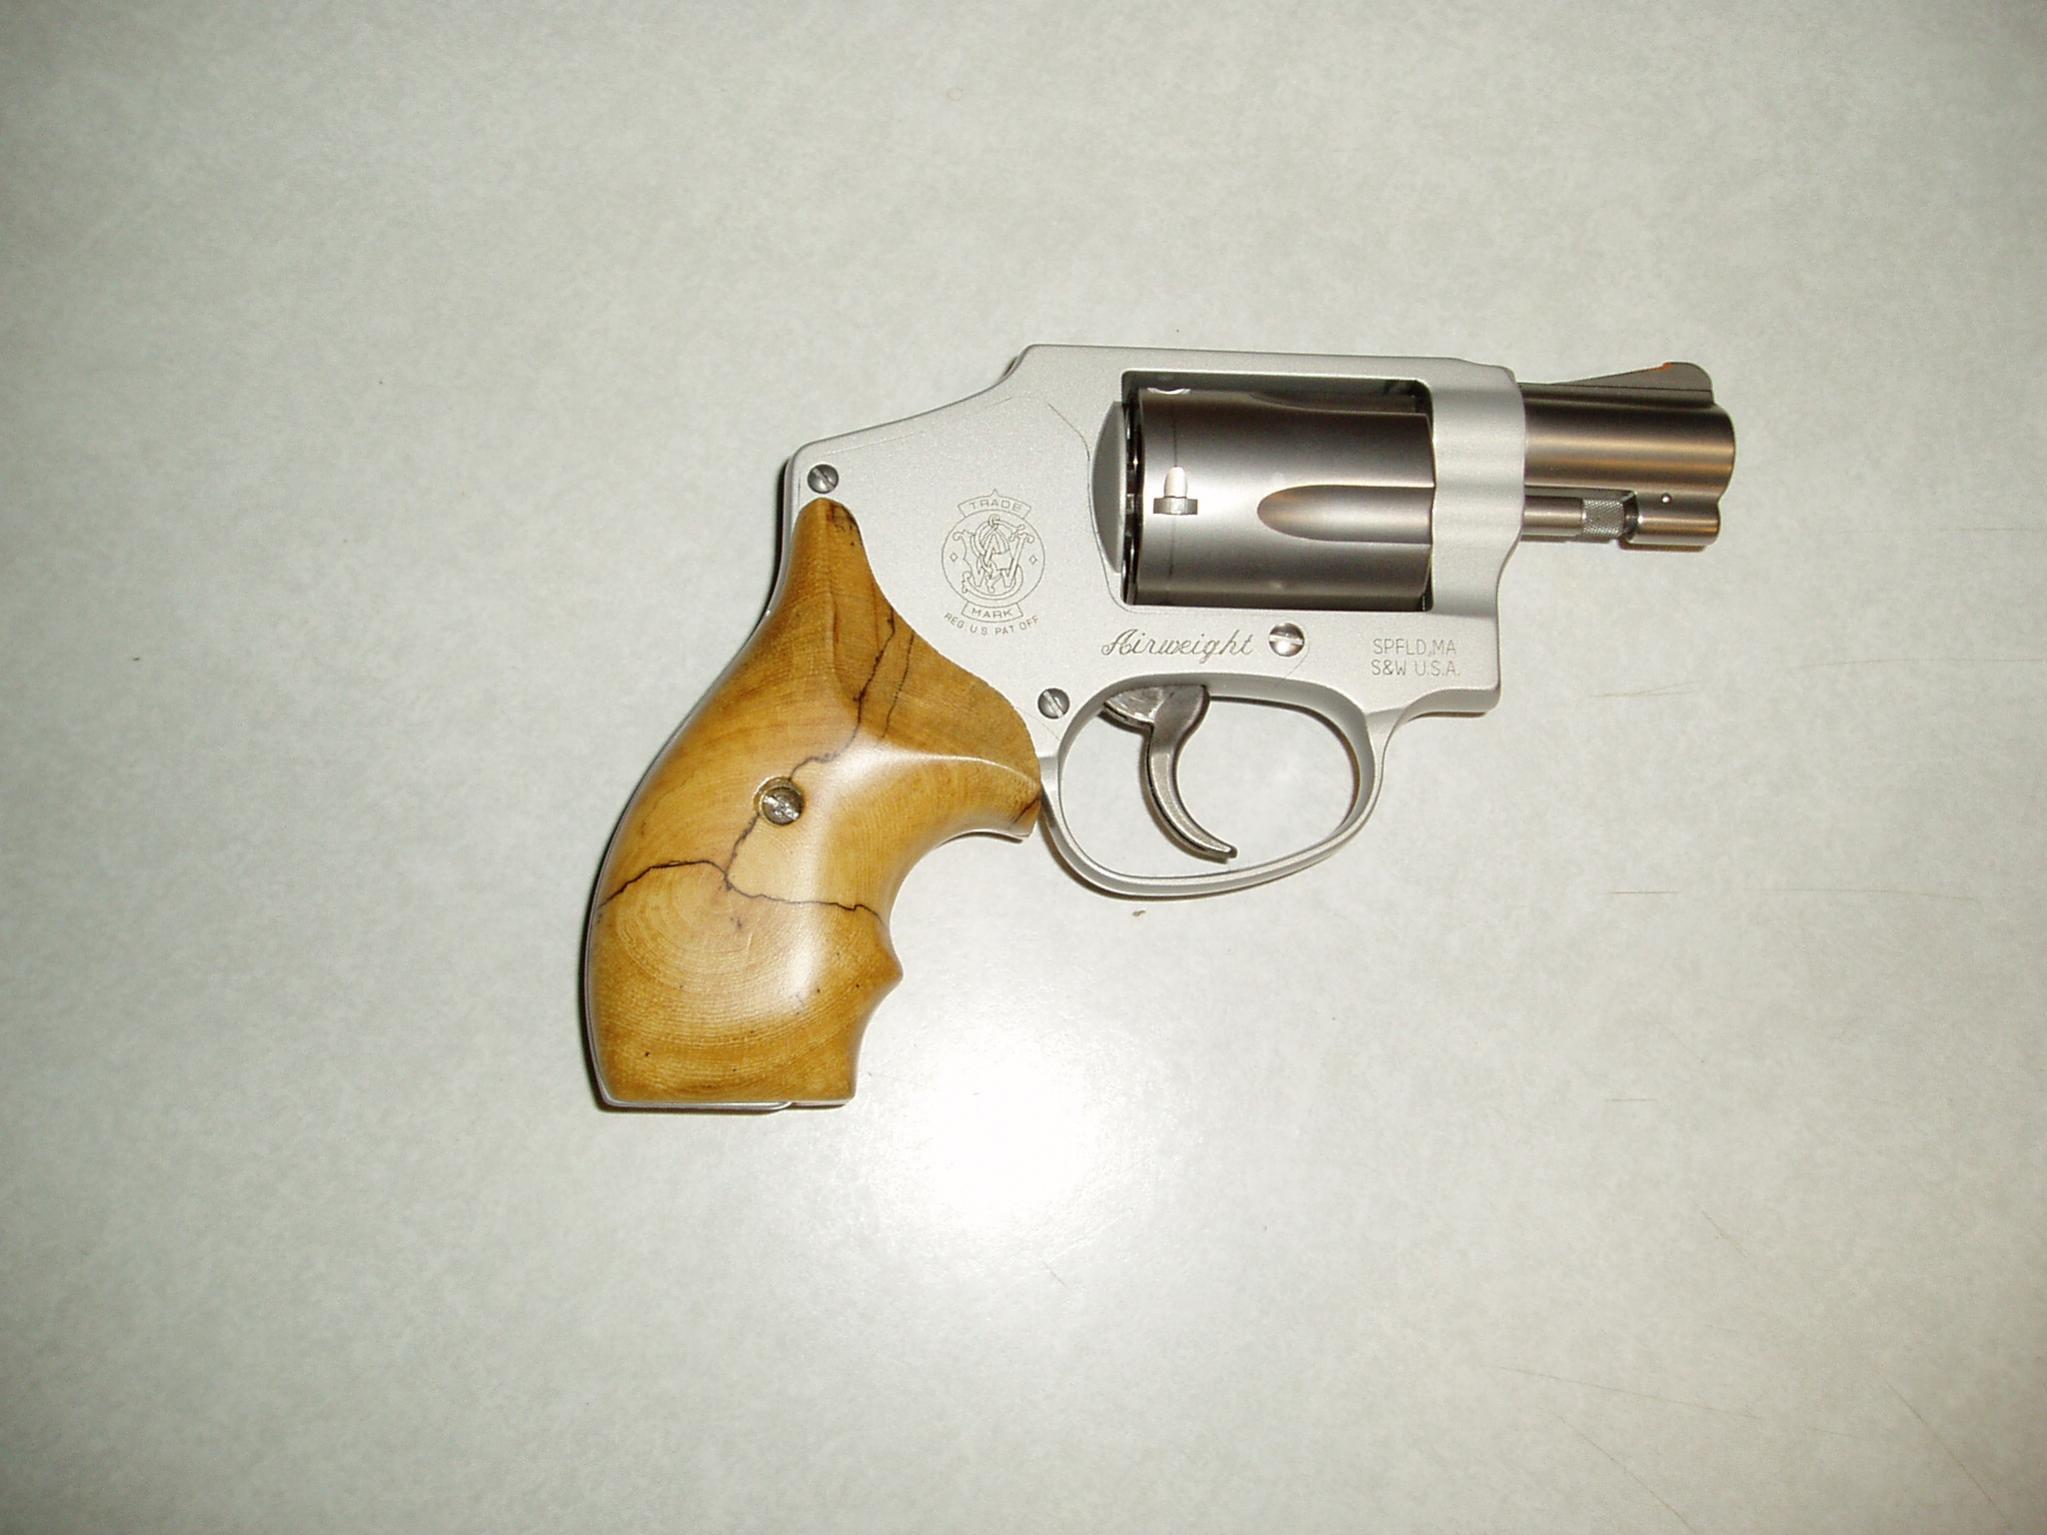 I think I want a snubbie-guns-010.jpg